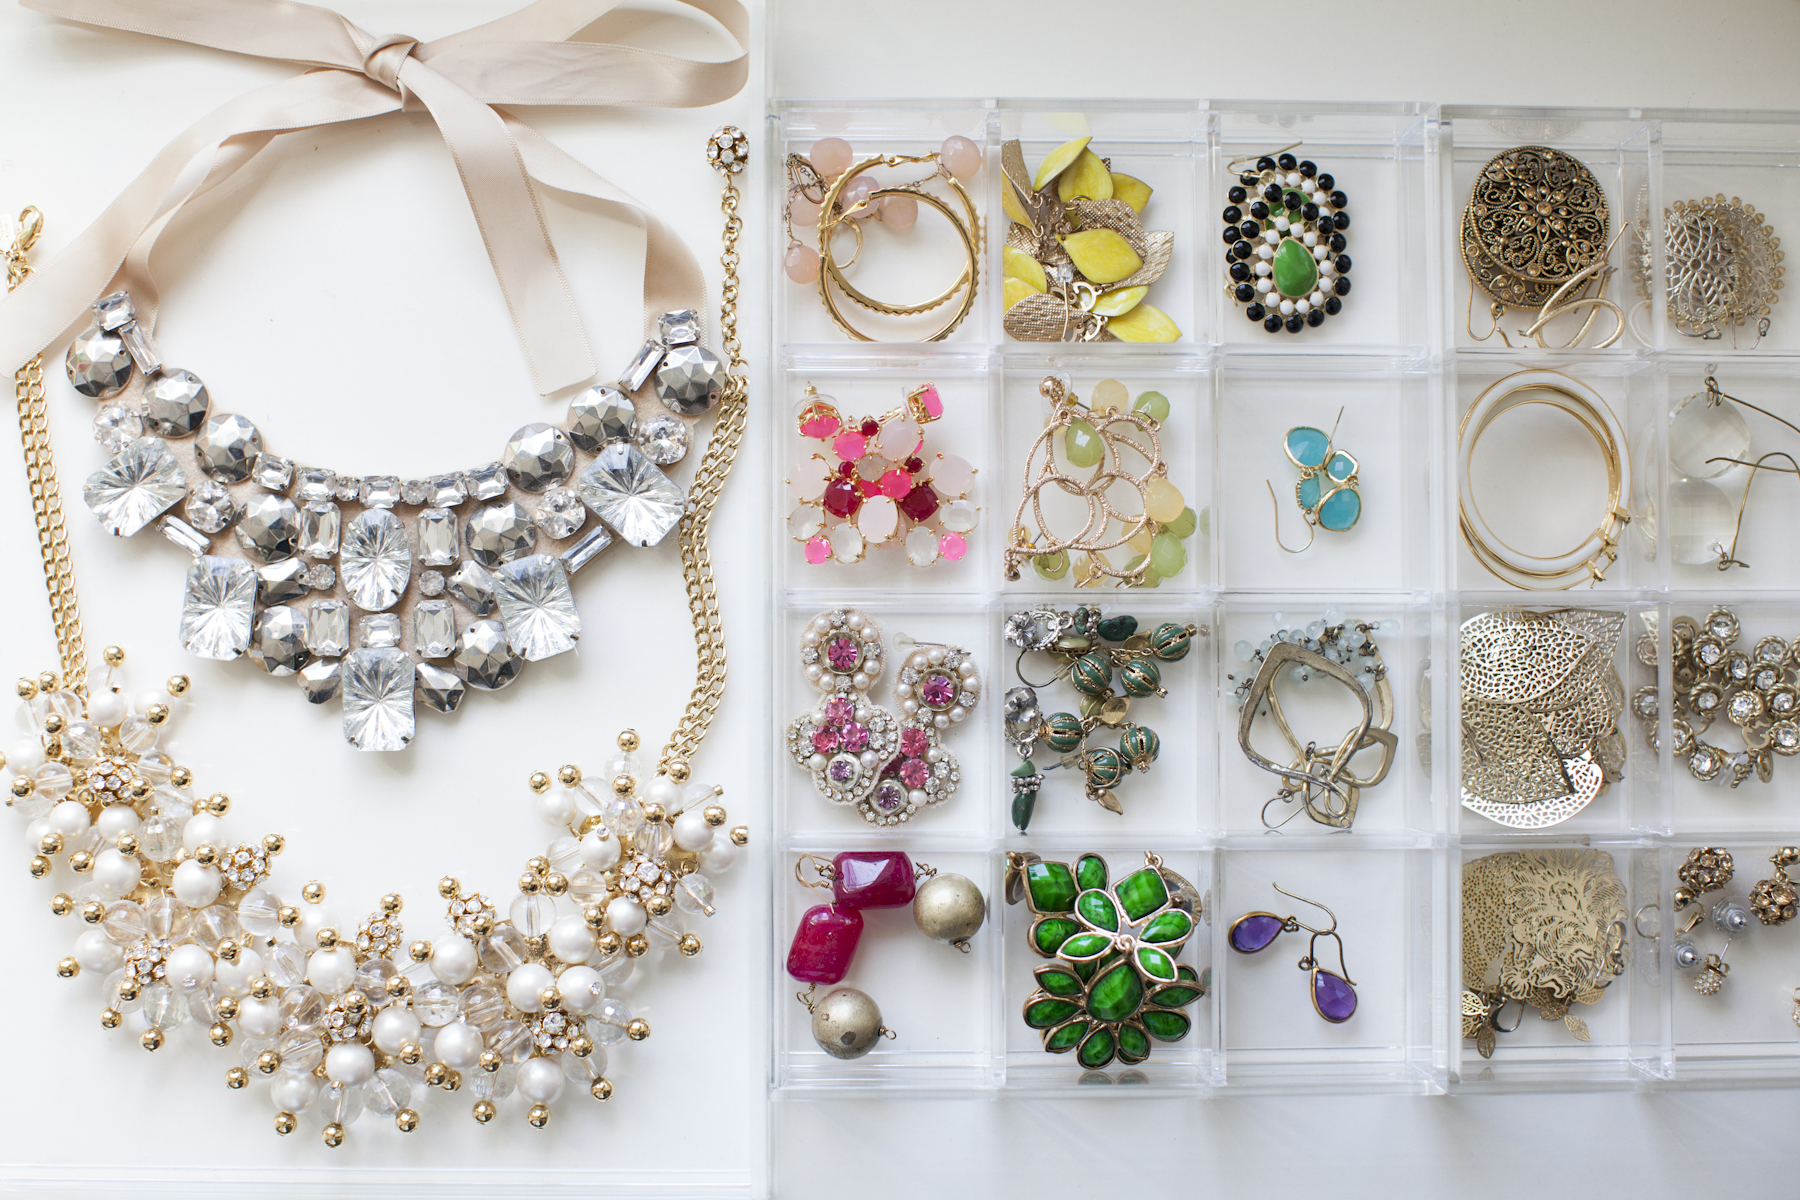 organized jewelry // Organizing Spotlight: Neat Method // Arianna Belle Blog